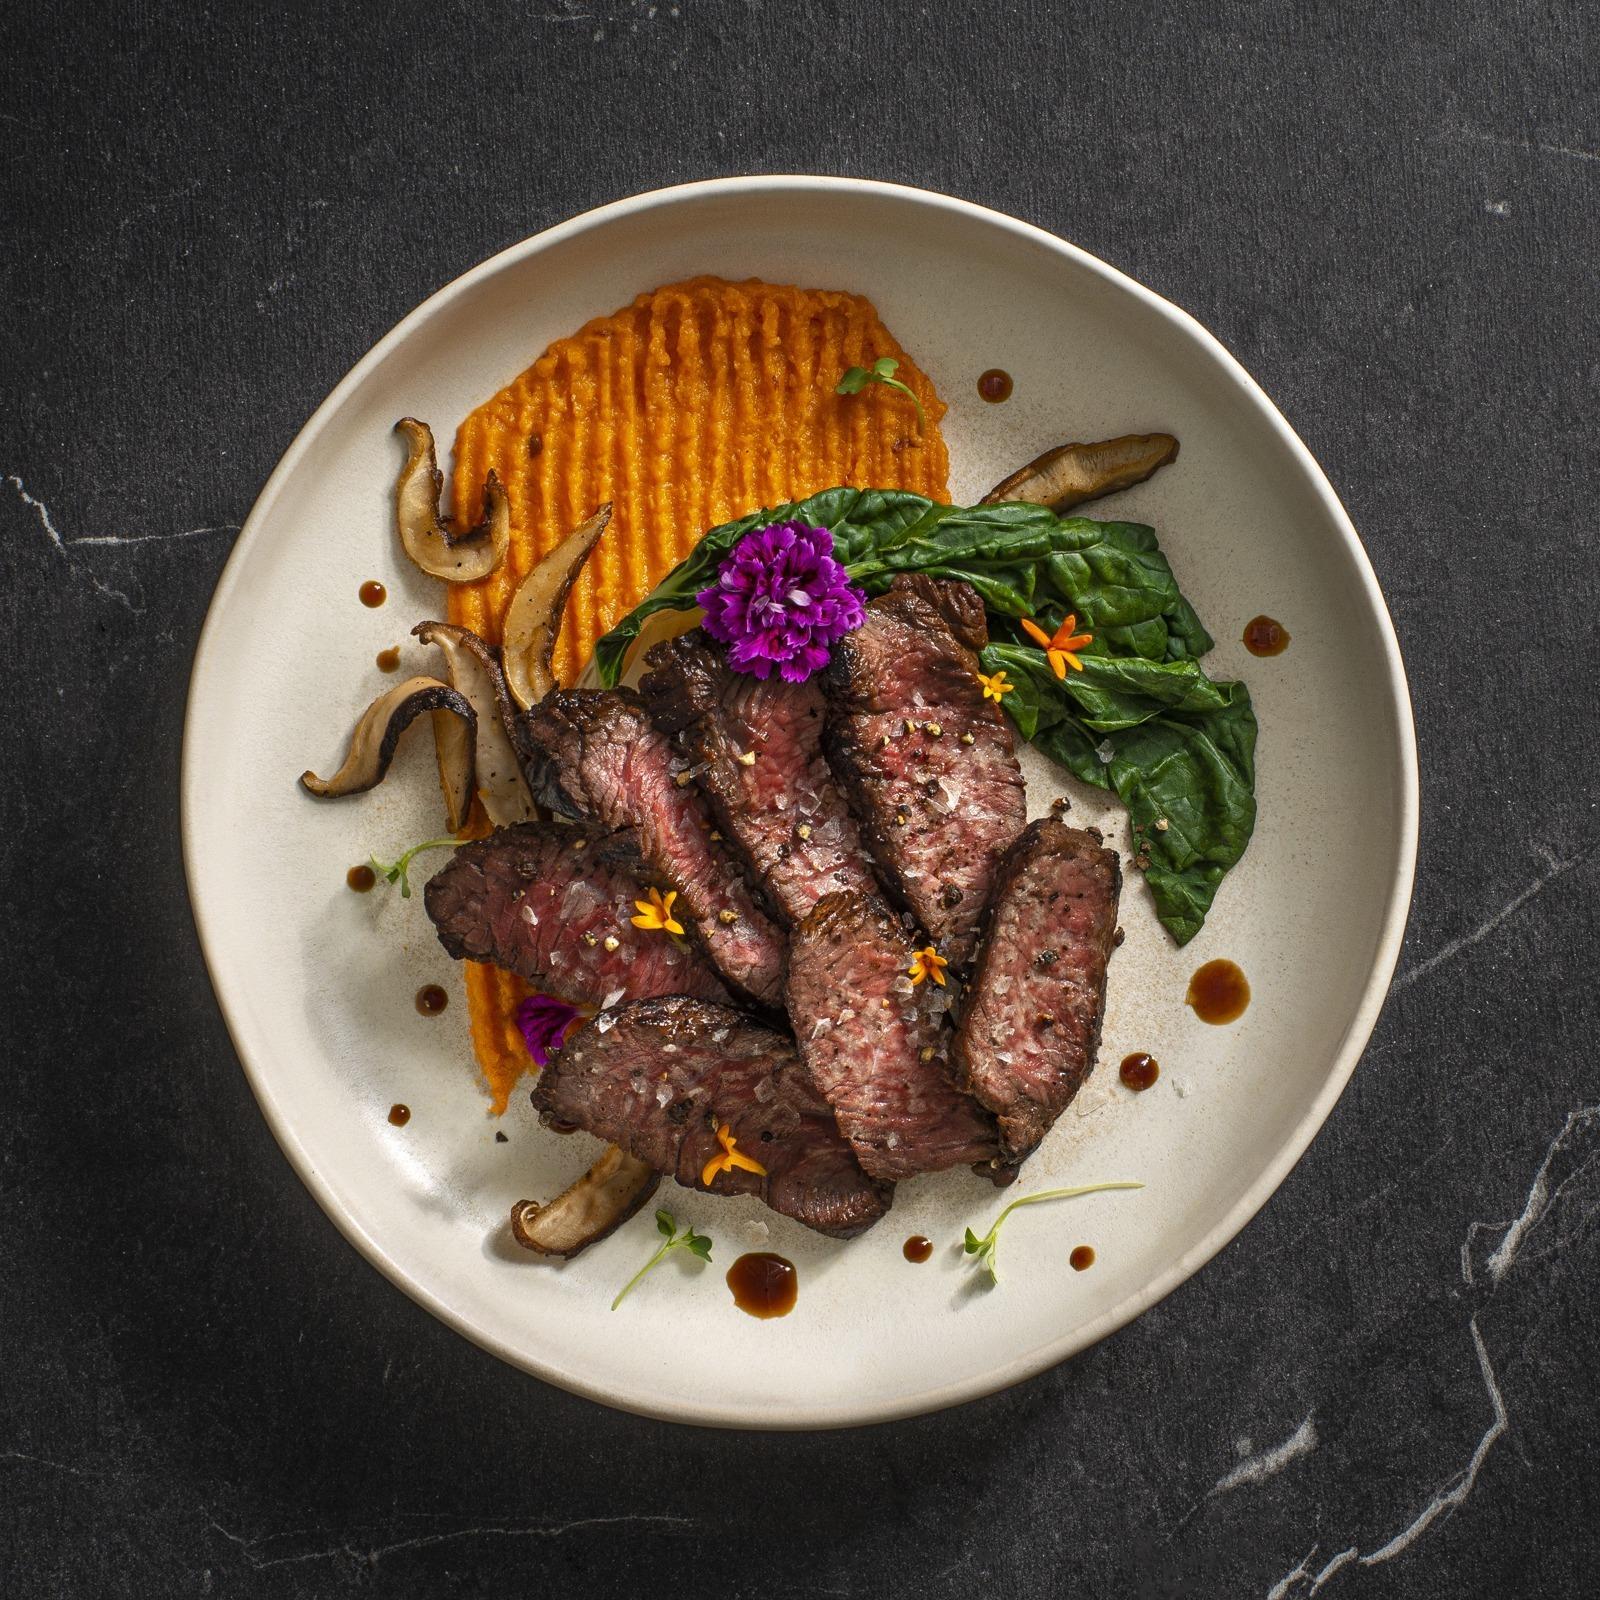 surlonge de bison teriyaki avec patate douce